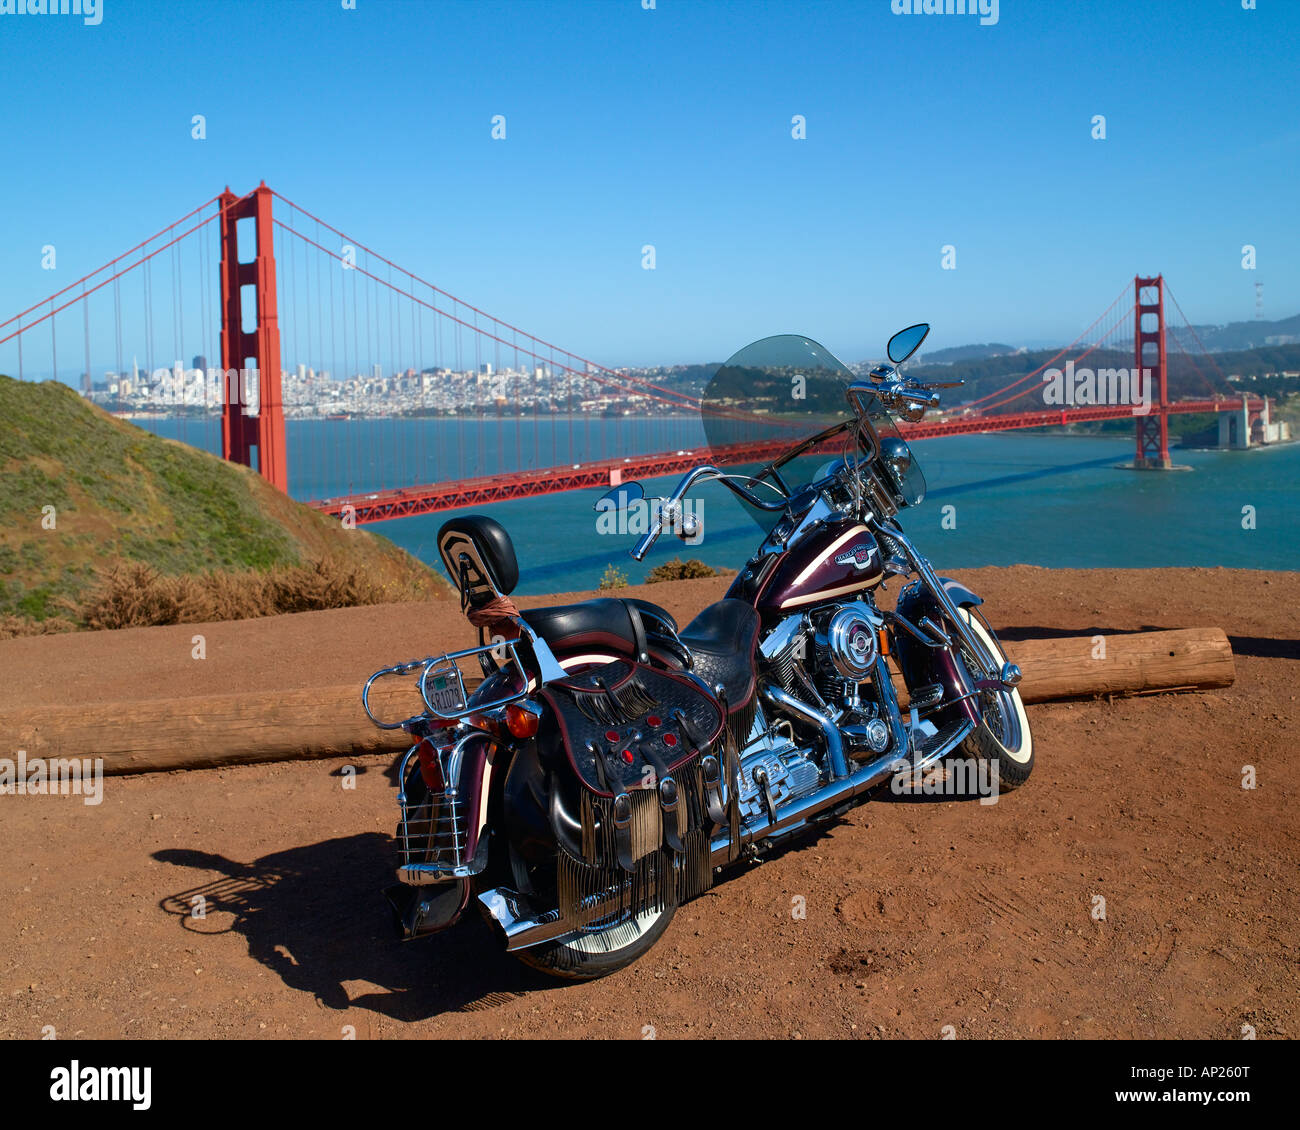 Harley Davidson San Francisco >> Harley Davidson Motorbike And Golden Gate Bridge San